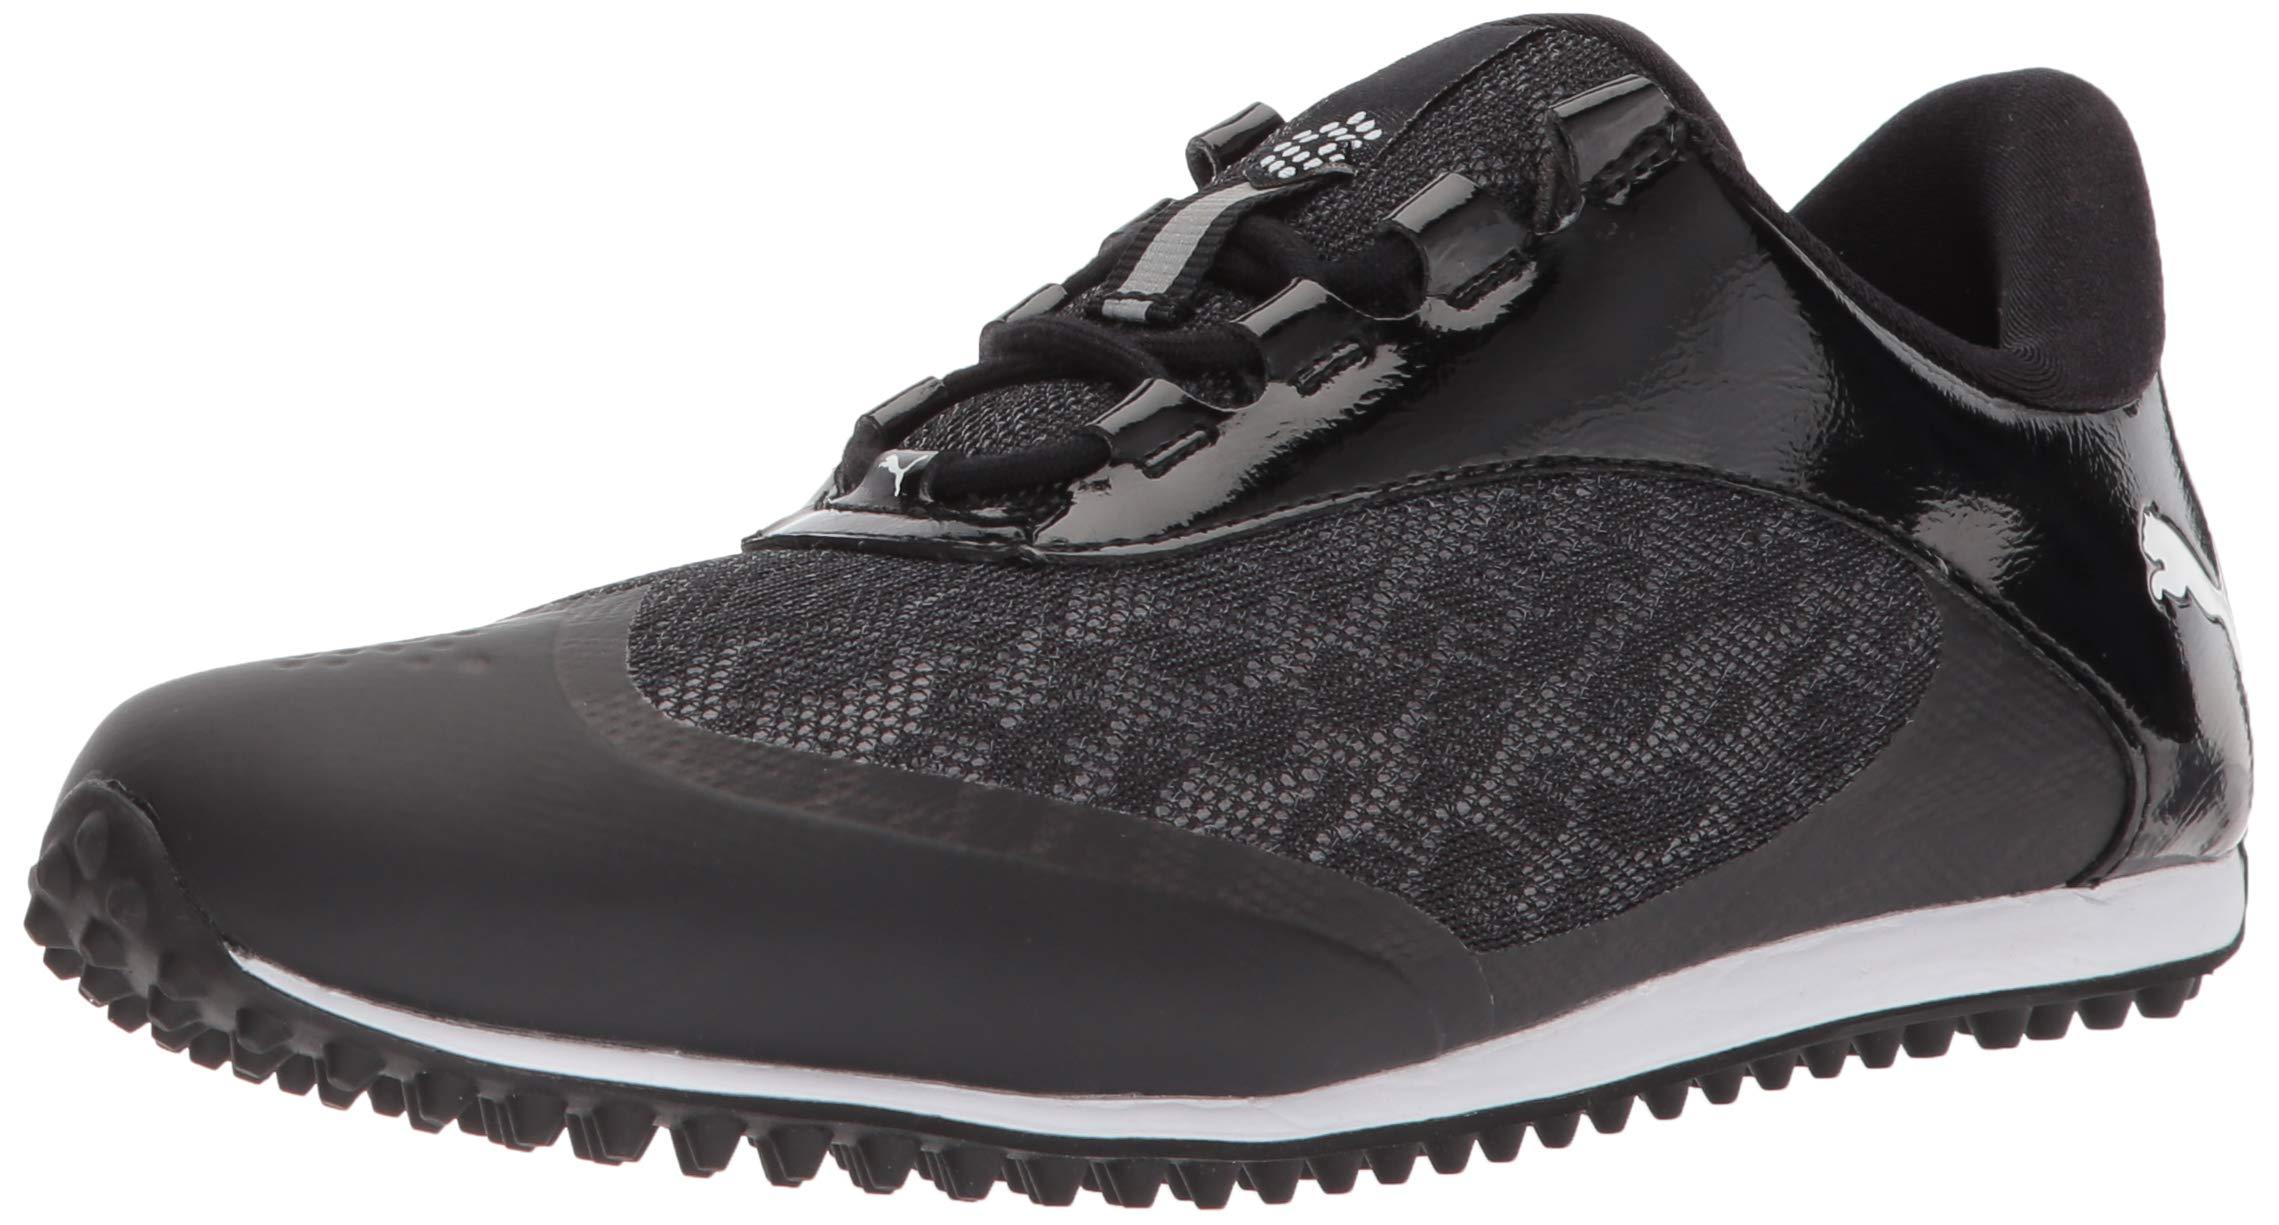 PUMA Golf Women's Summercat Sport Golf Shoe, Black/White, 7.5 Medium US by PUMA